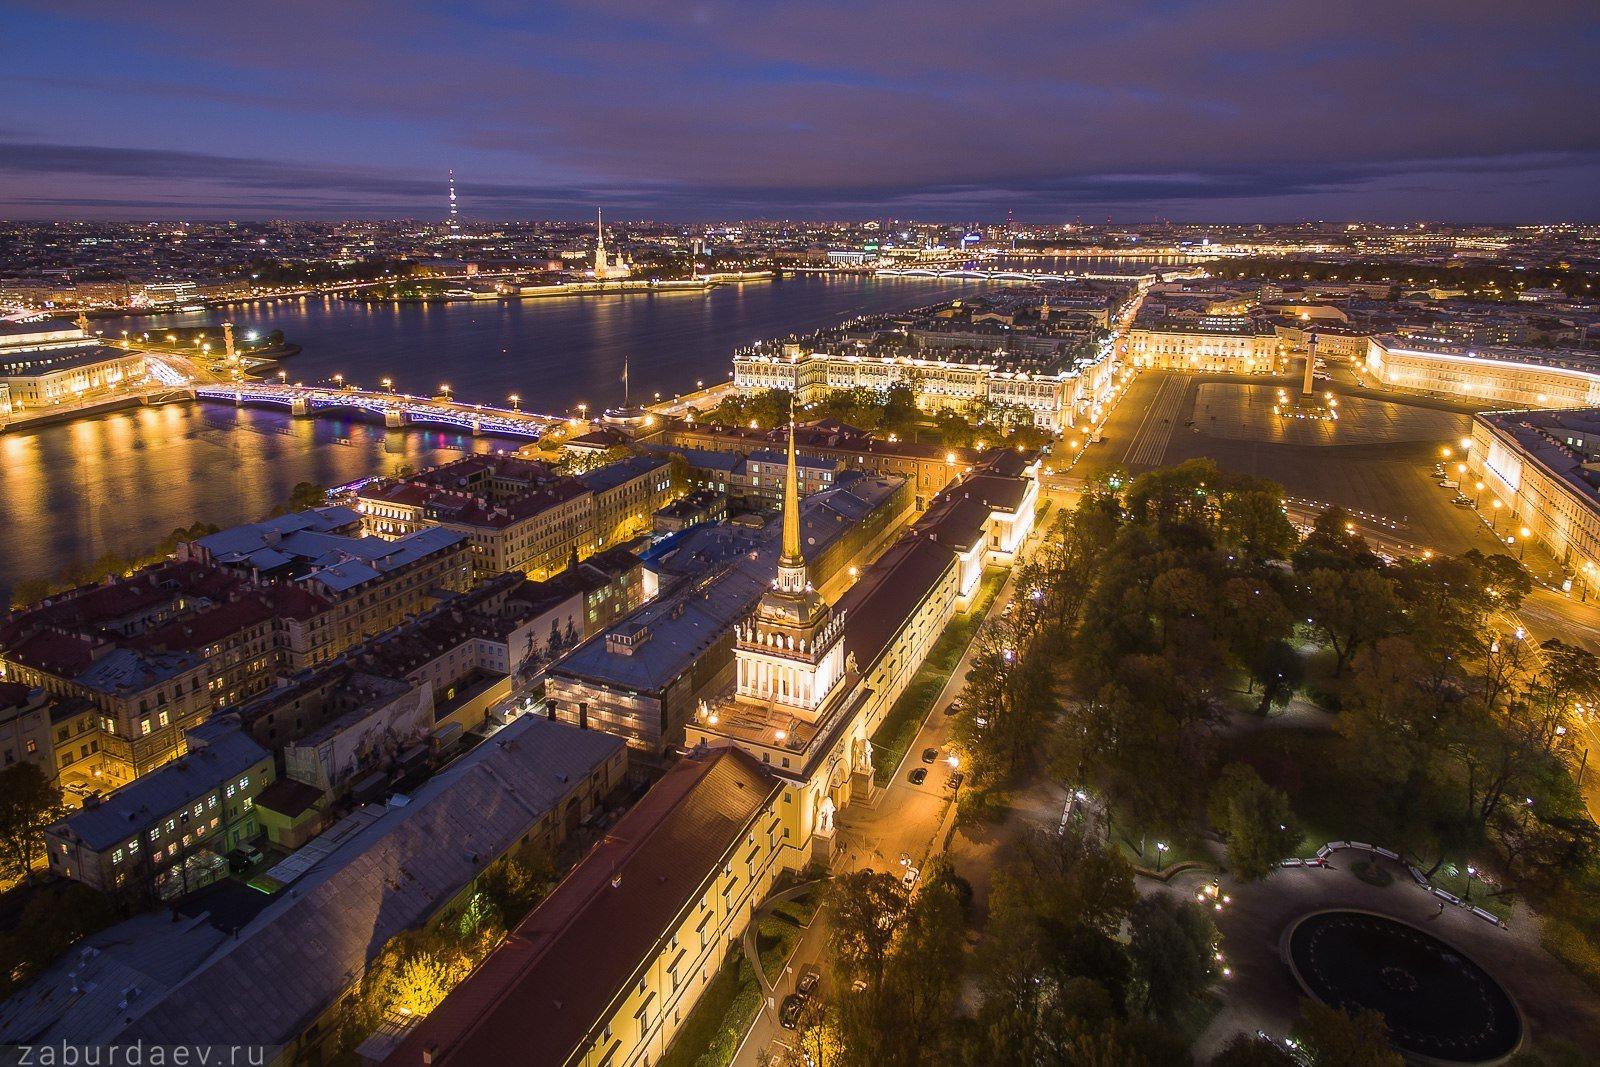 Картинки города санкт петербурга